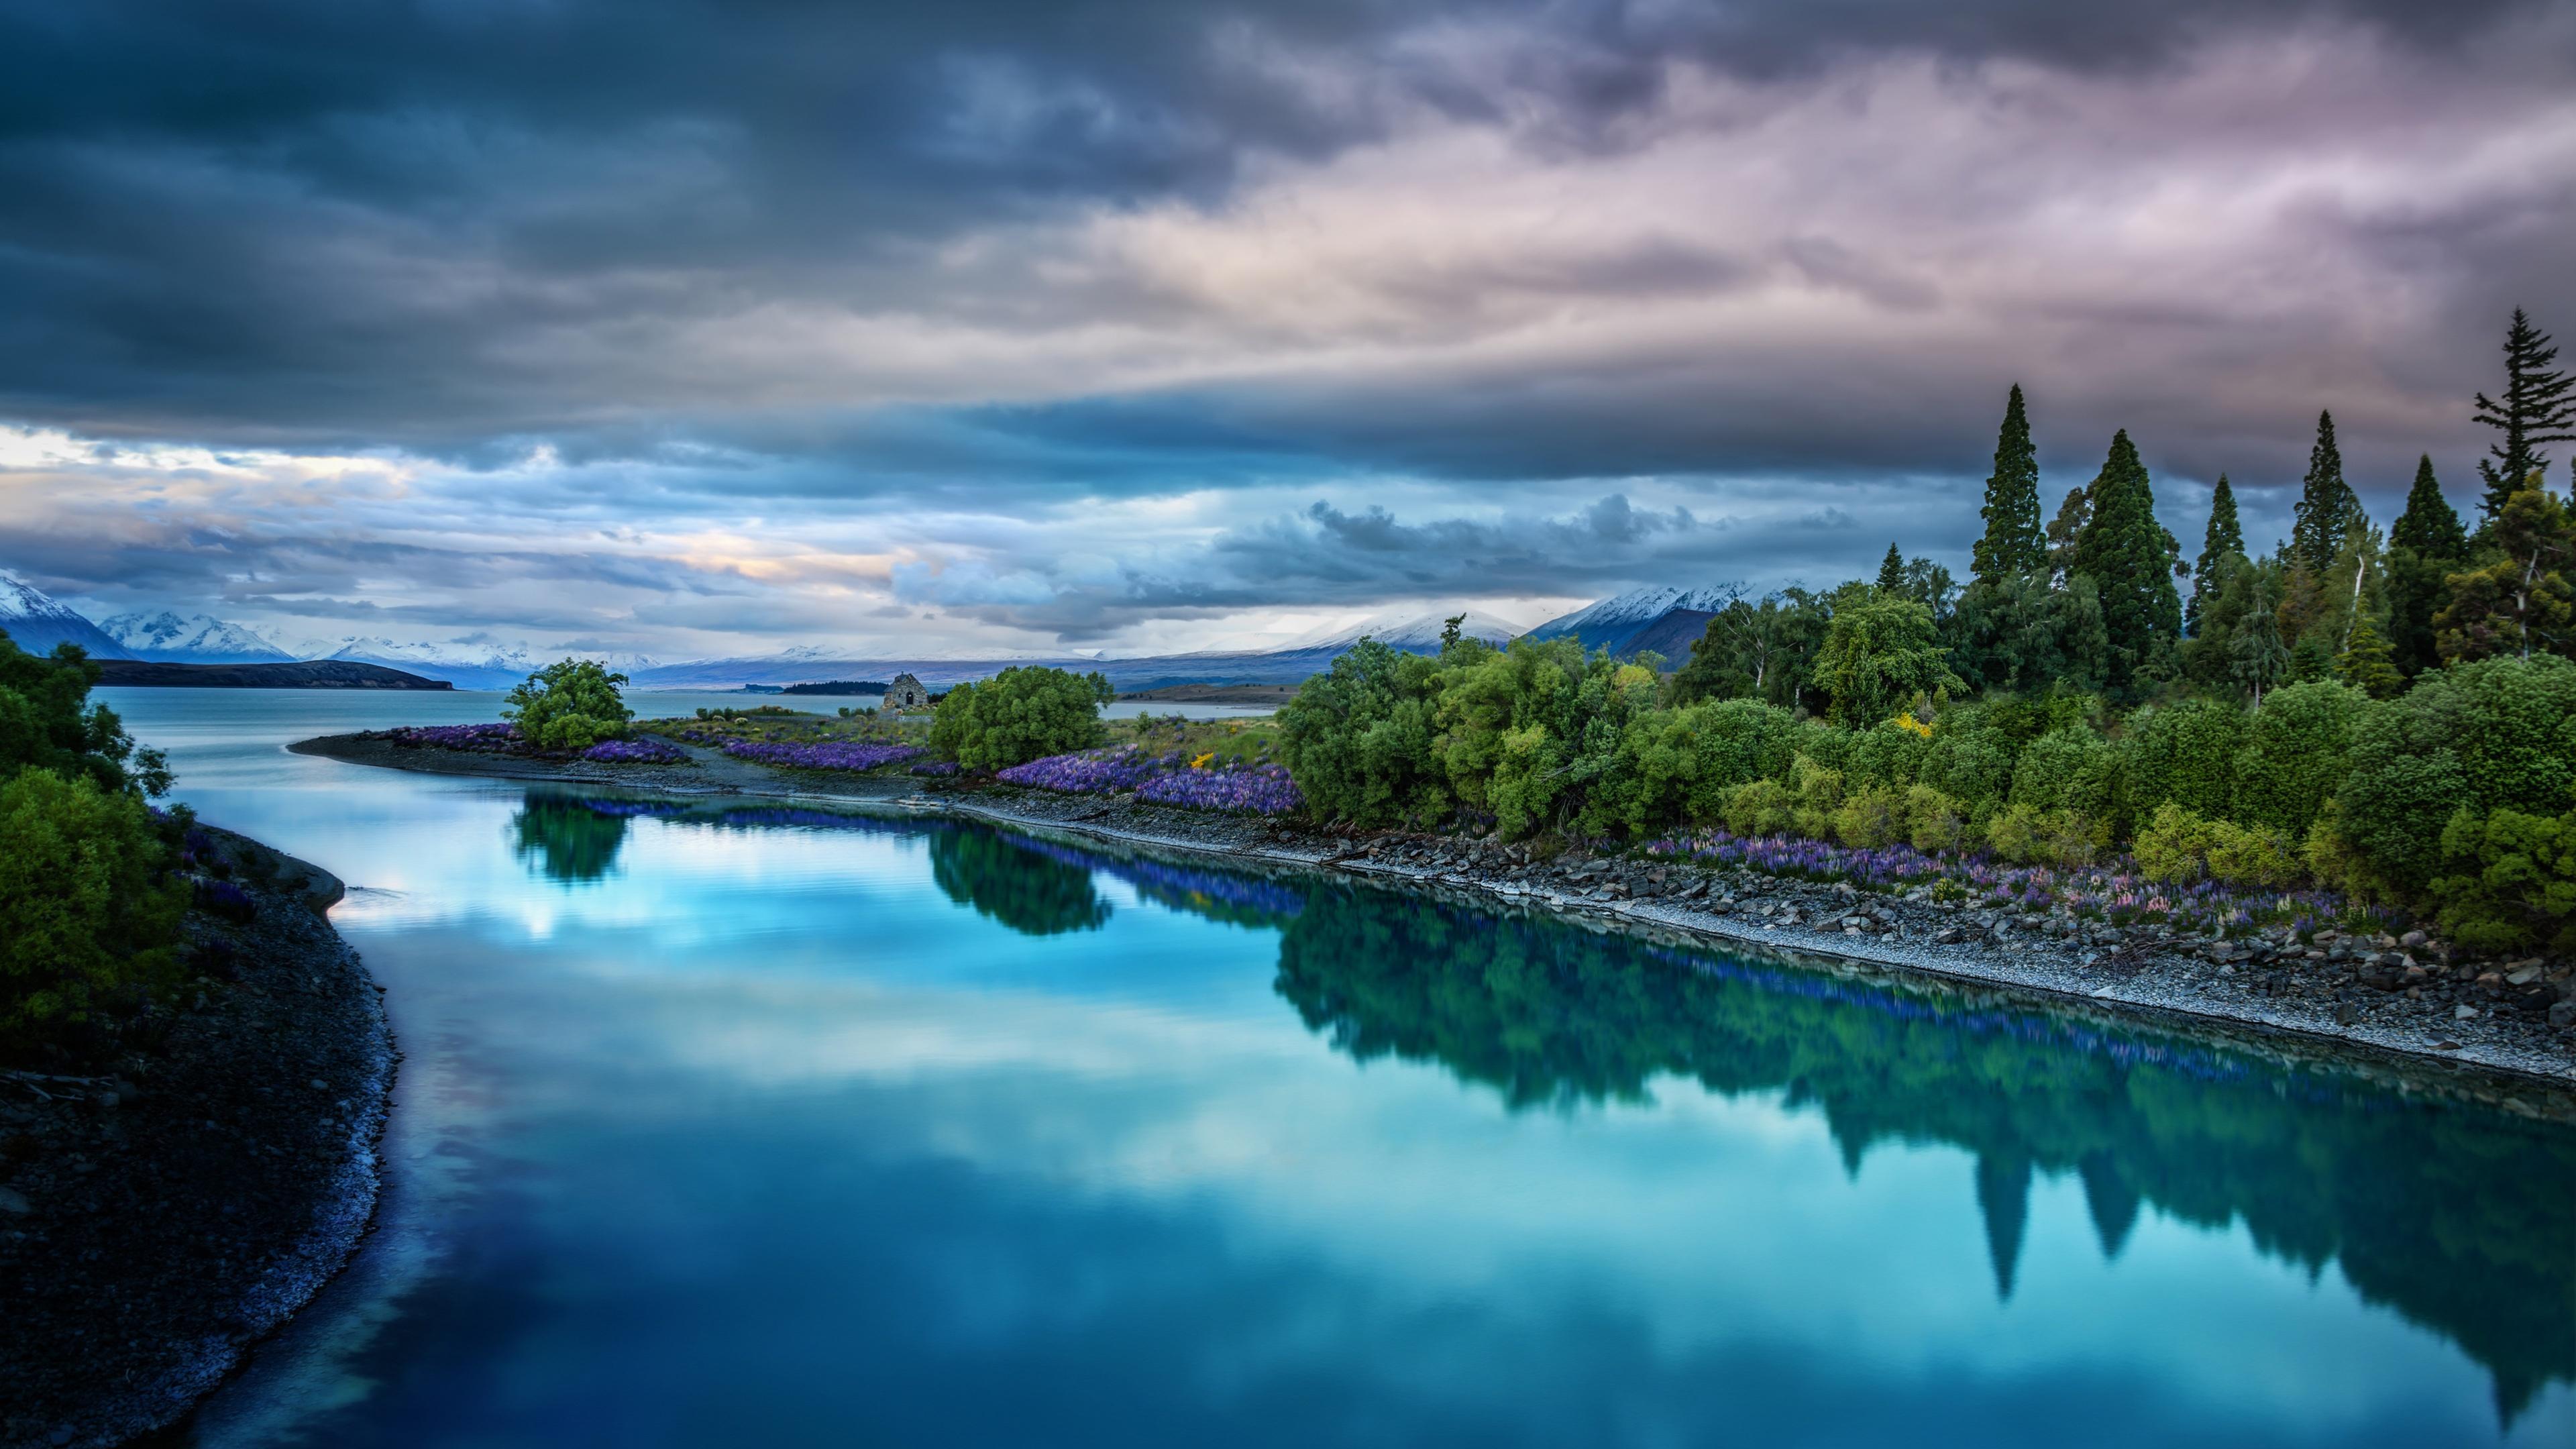 New Zealand Lake Tekapo 3840 x 2160 3840x2160